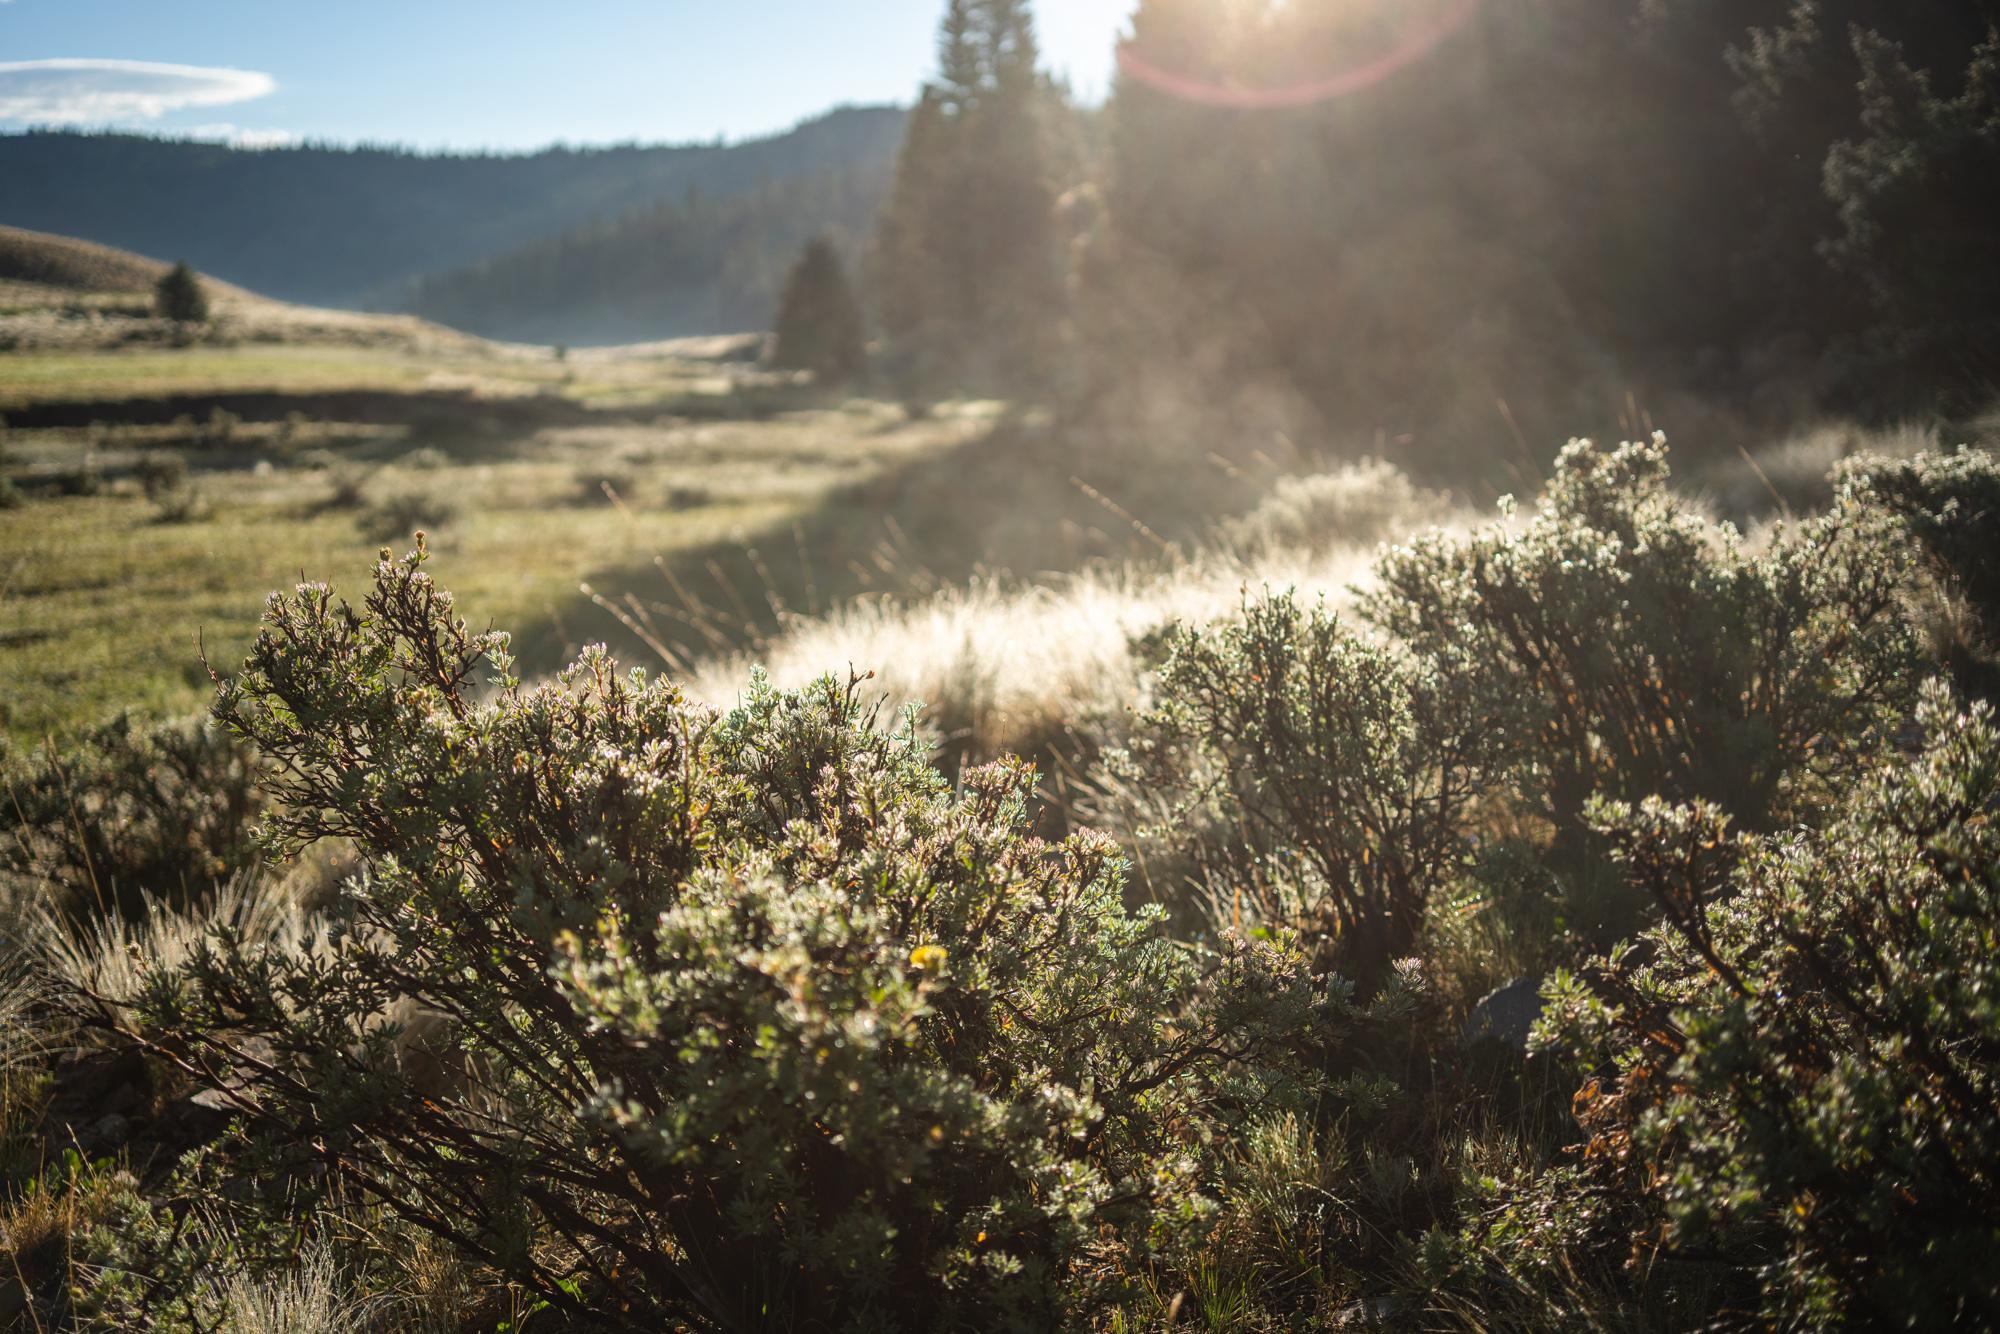 Morning steam rising